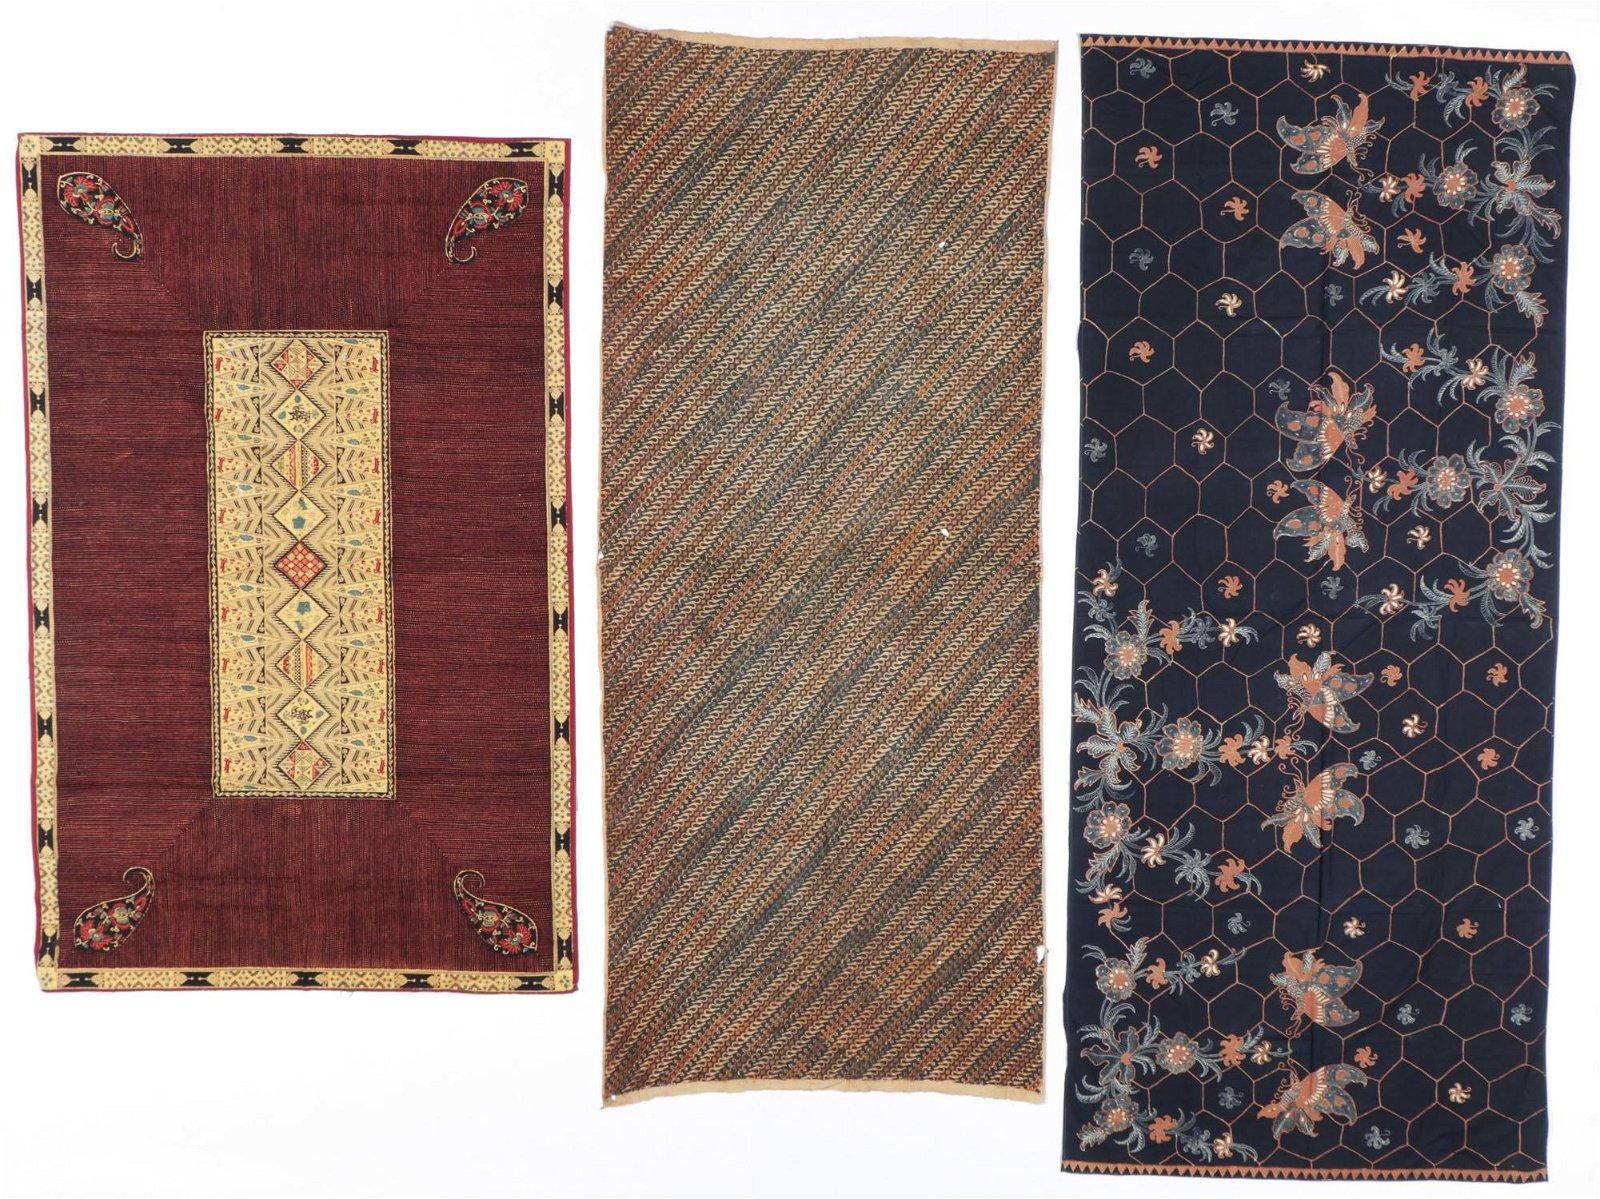 3 Indonesian Batik Textiles